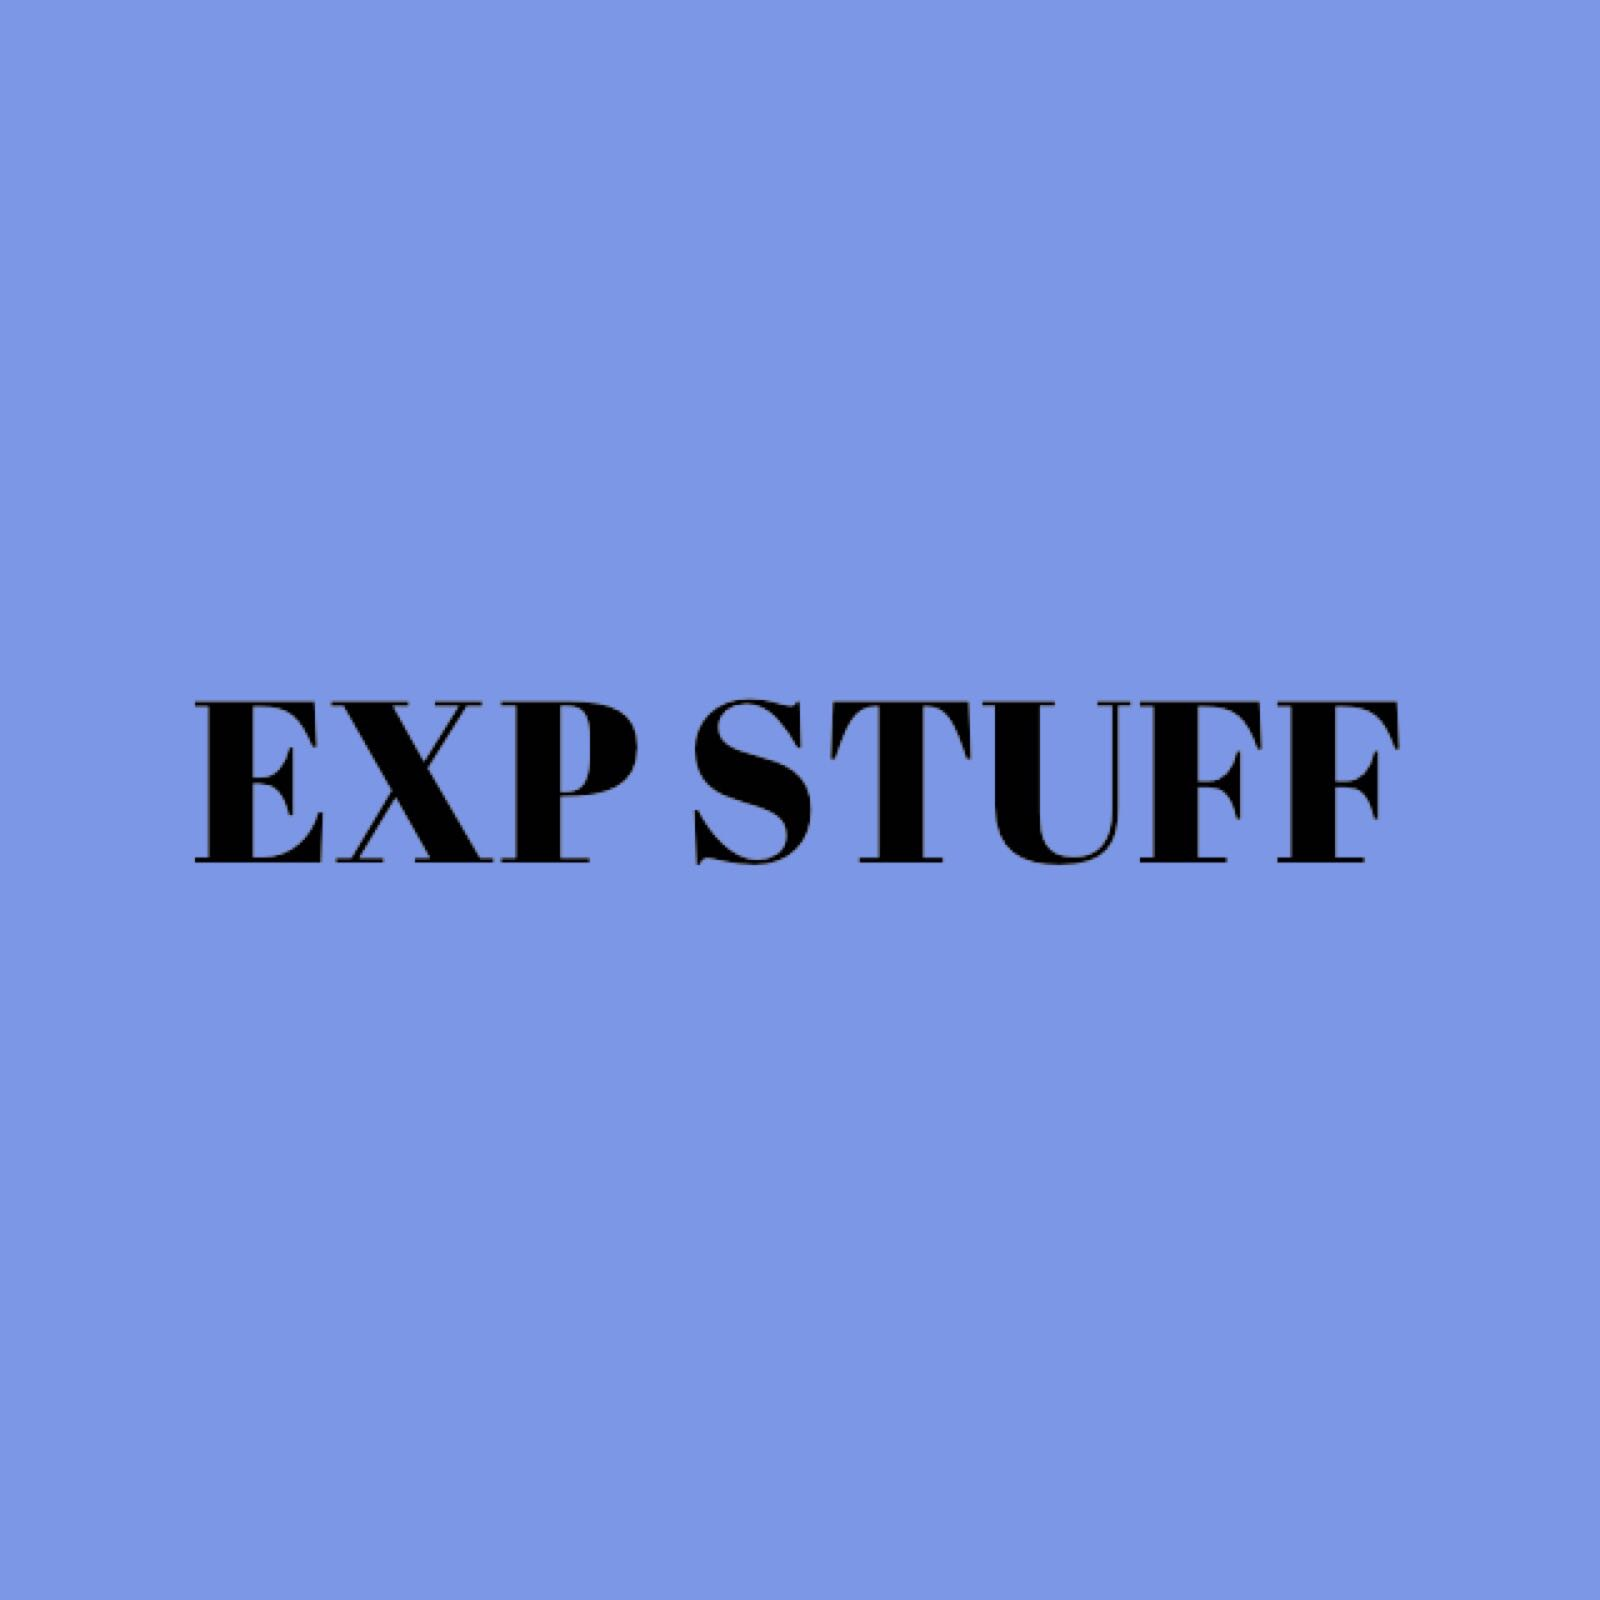 expstuff